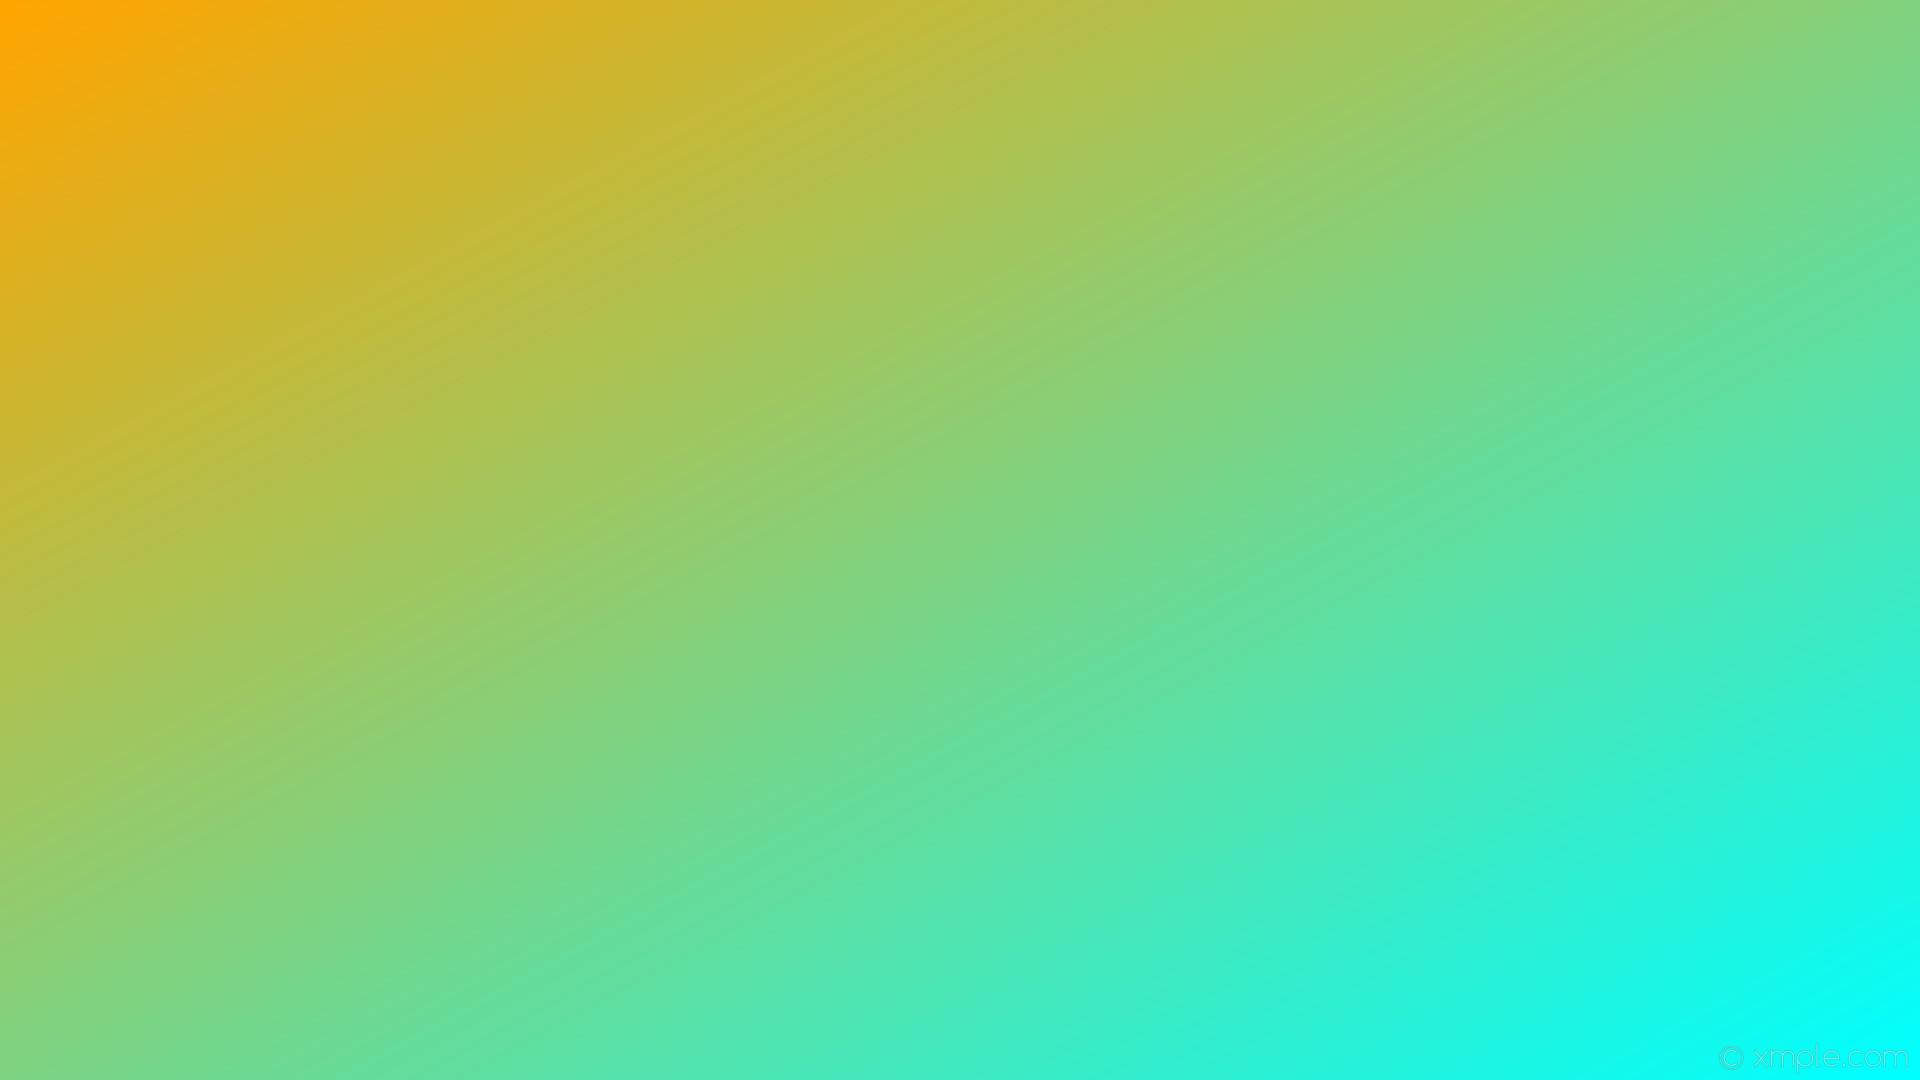 wallpaper gradient blue linear orange aqua cyan #ffa500 #00ffff 150°